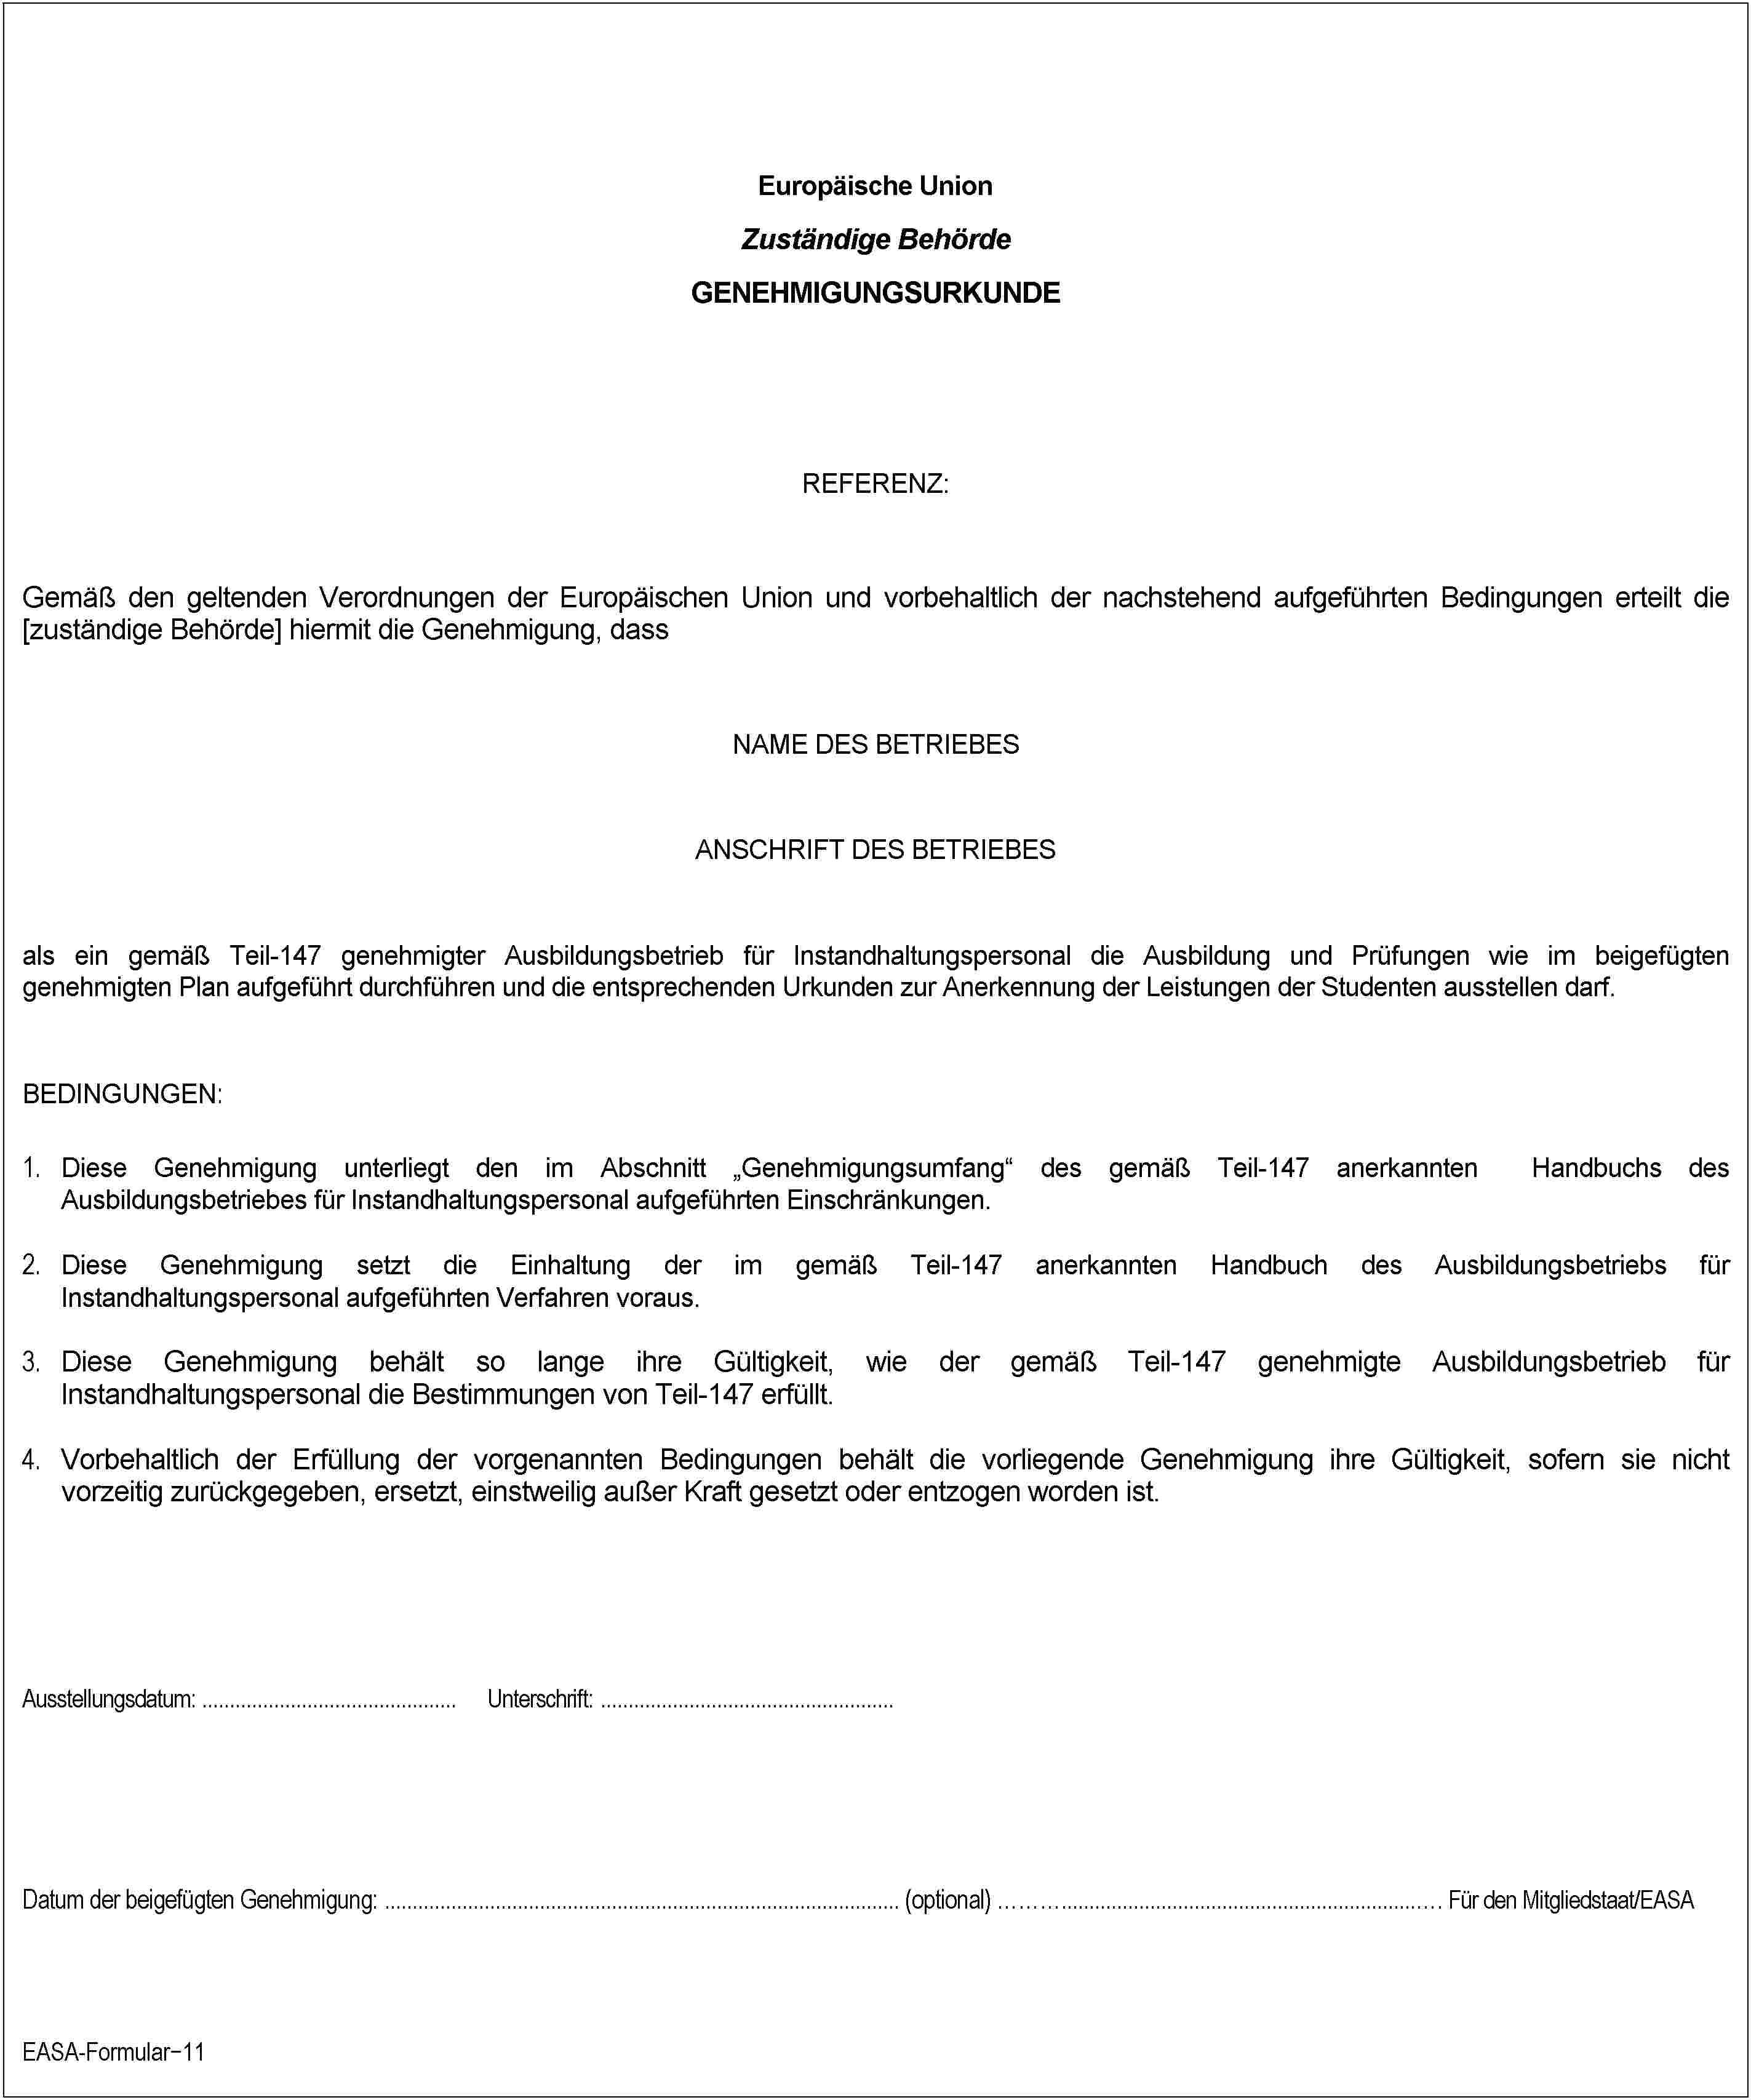 EUR-Lex - 02003R2042-20070405 - EN - EUR-Lex